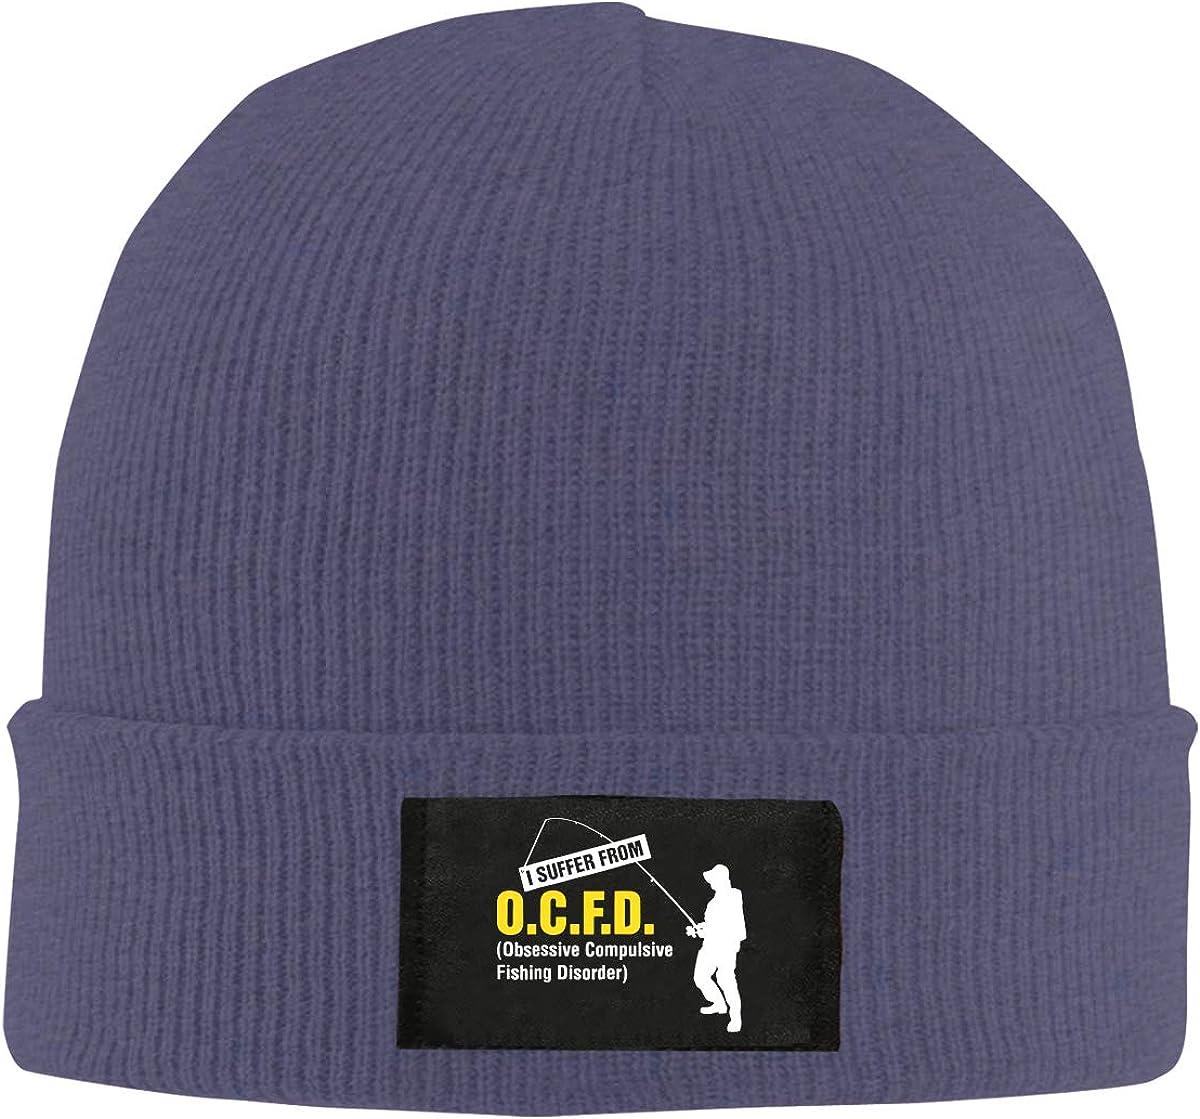 Obsessive Compulsive Fishing Unisex Warm Winter Hat Knit Beanie Skull Cap Cuff Beanie Hat Winter Hats